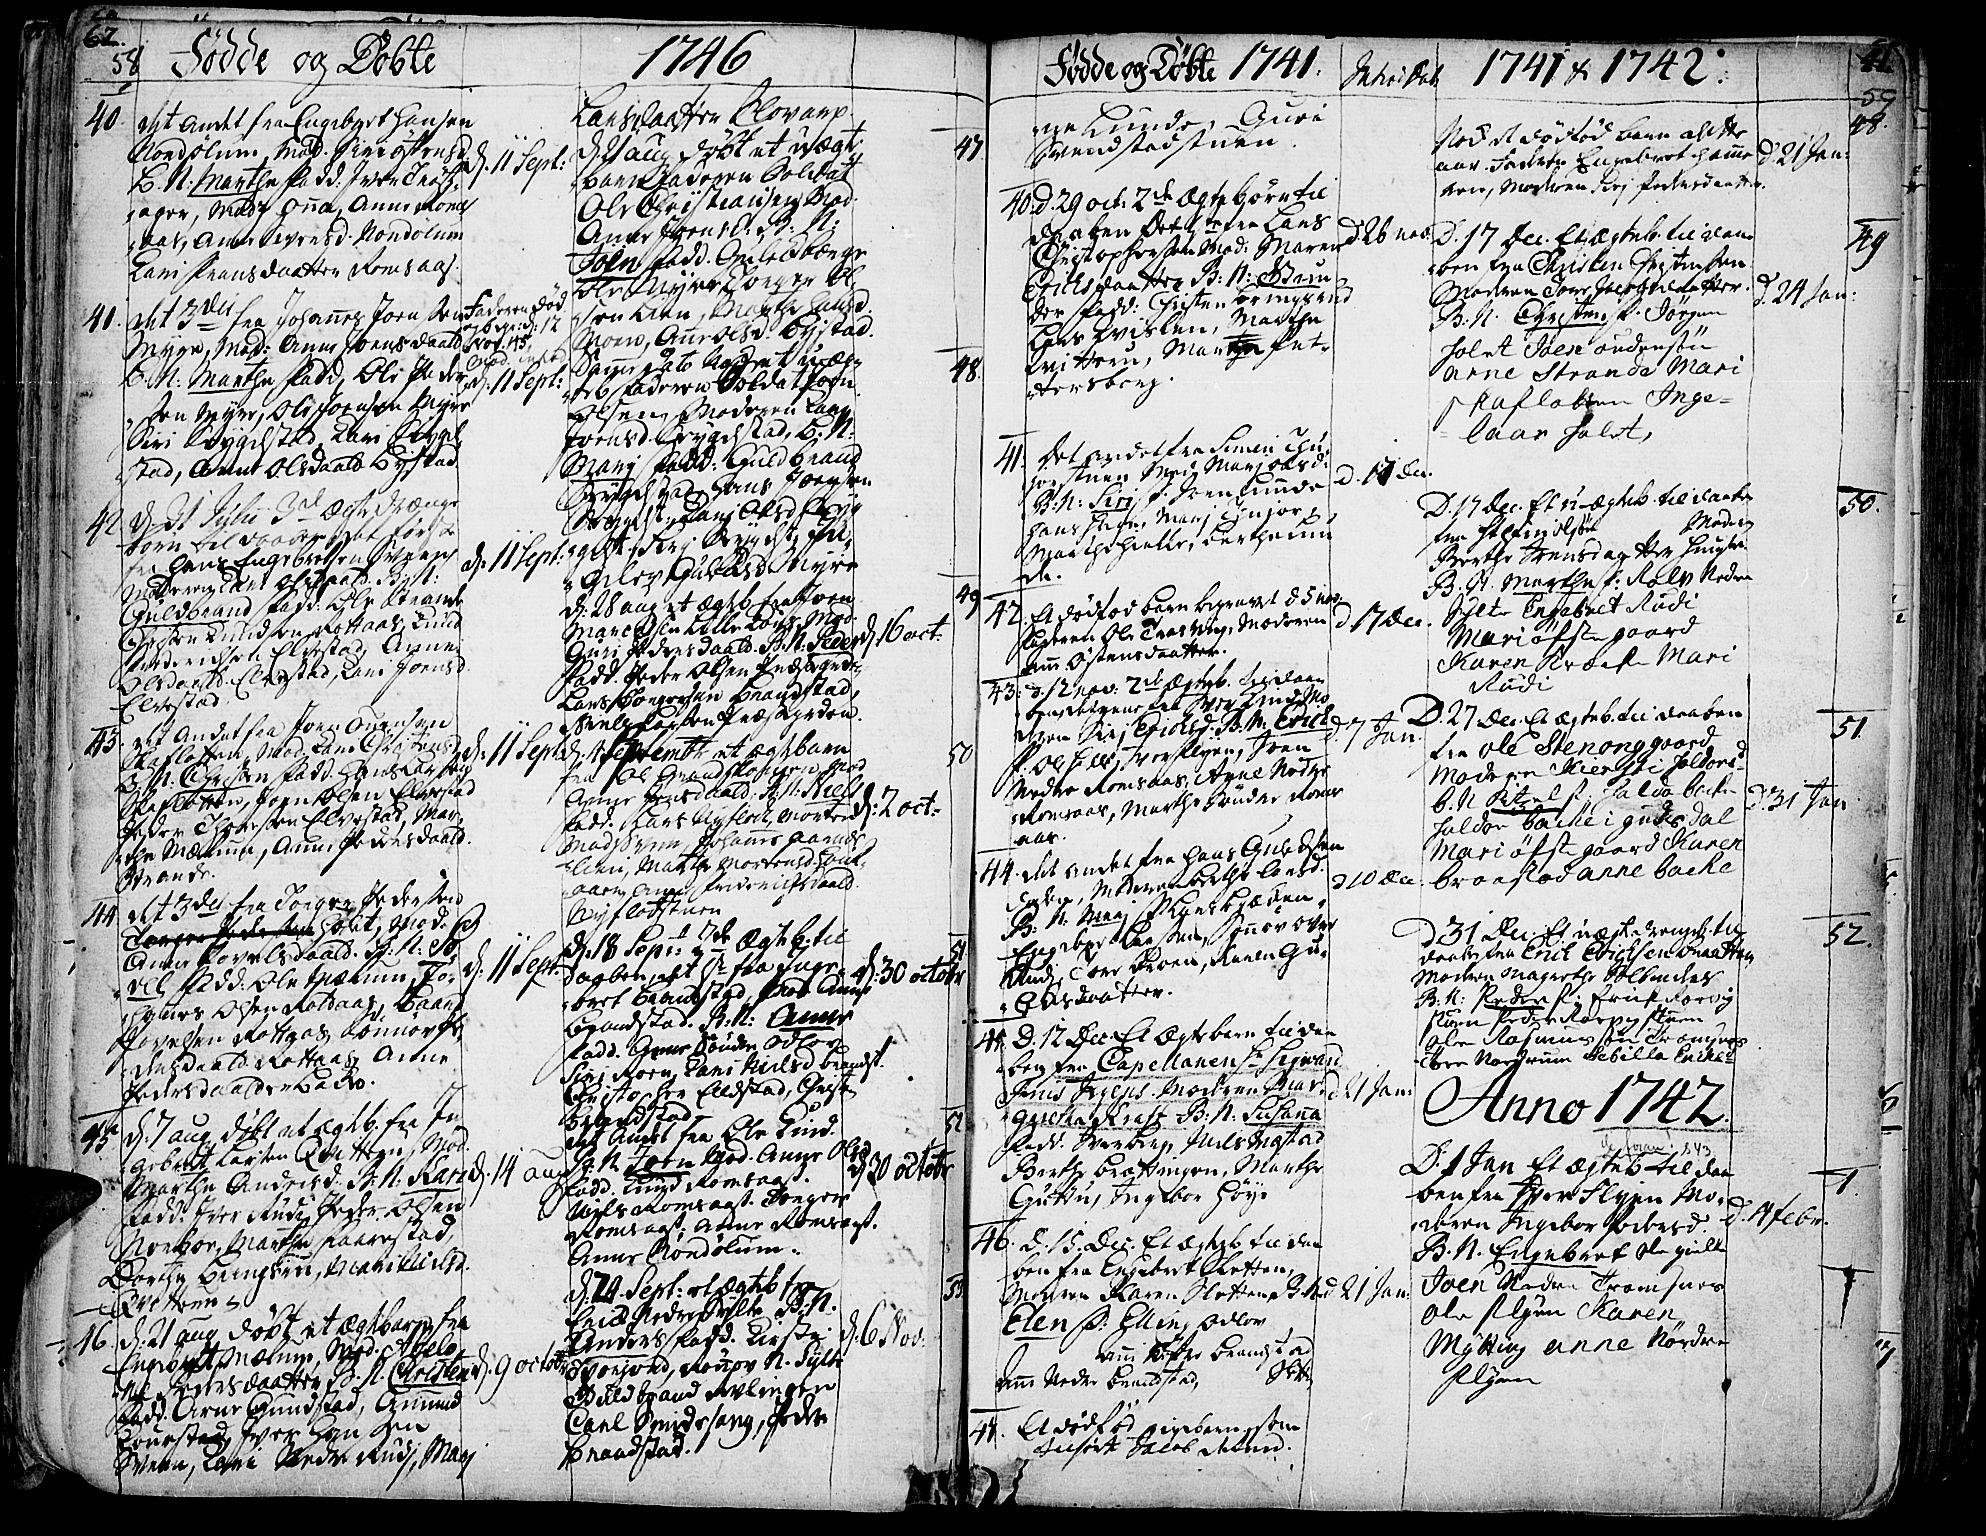 SAH, Ringebu prestekontor, Ministerialbok nr. 2, 1734-1780, s. 58-59